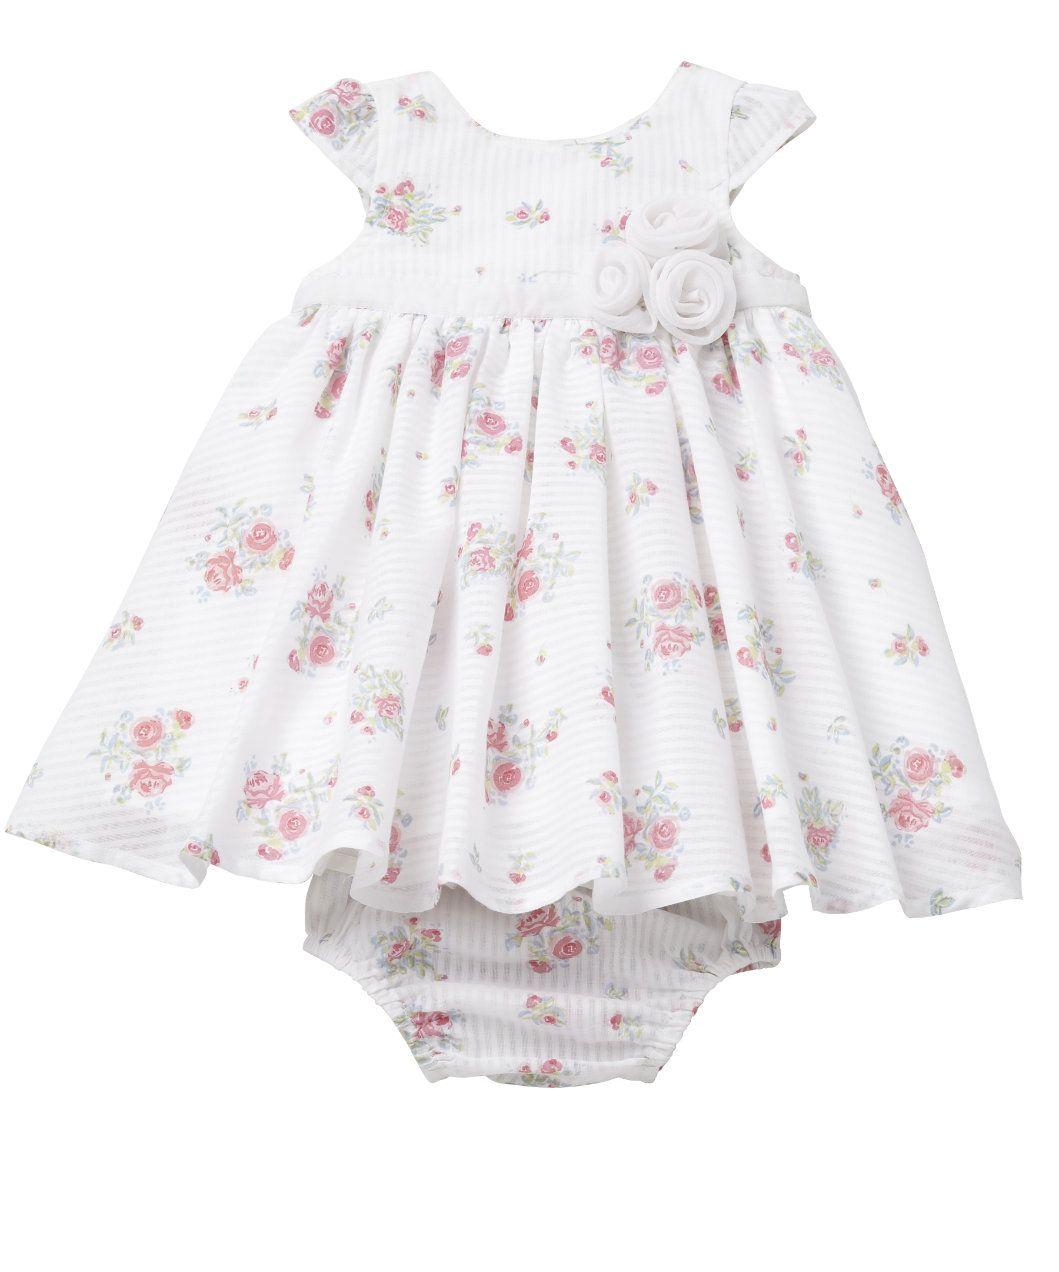 7bb246e43 Mothercare Stripe Floral Dress